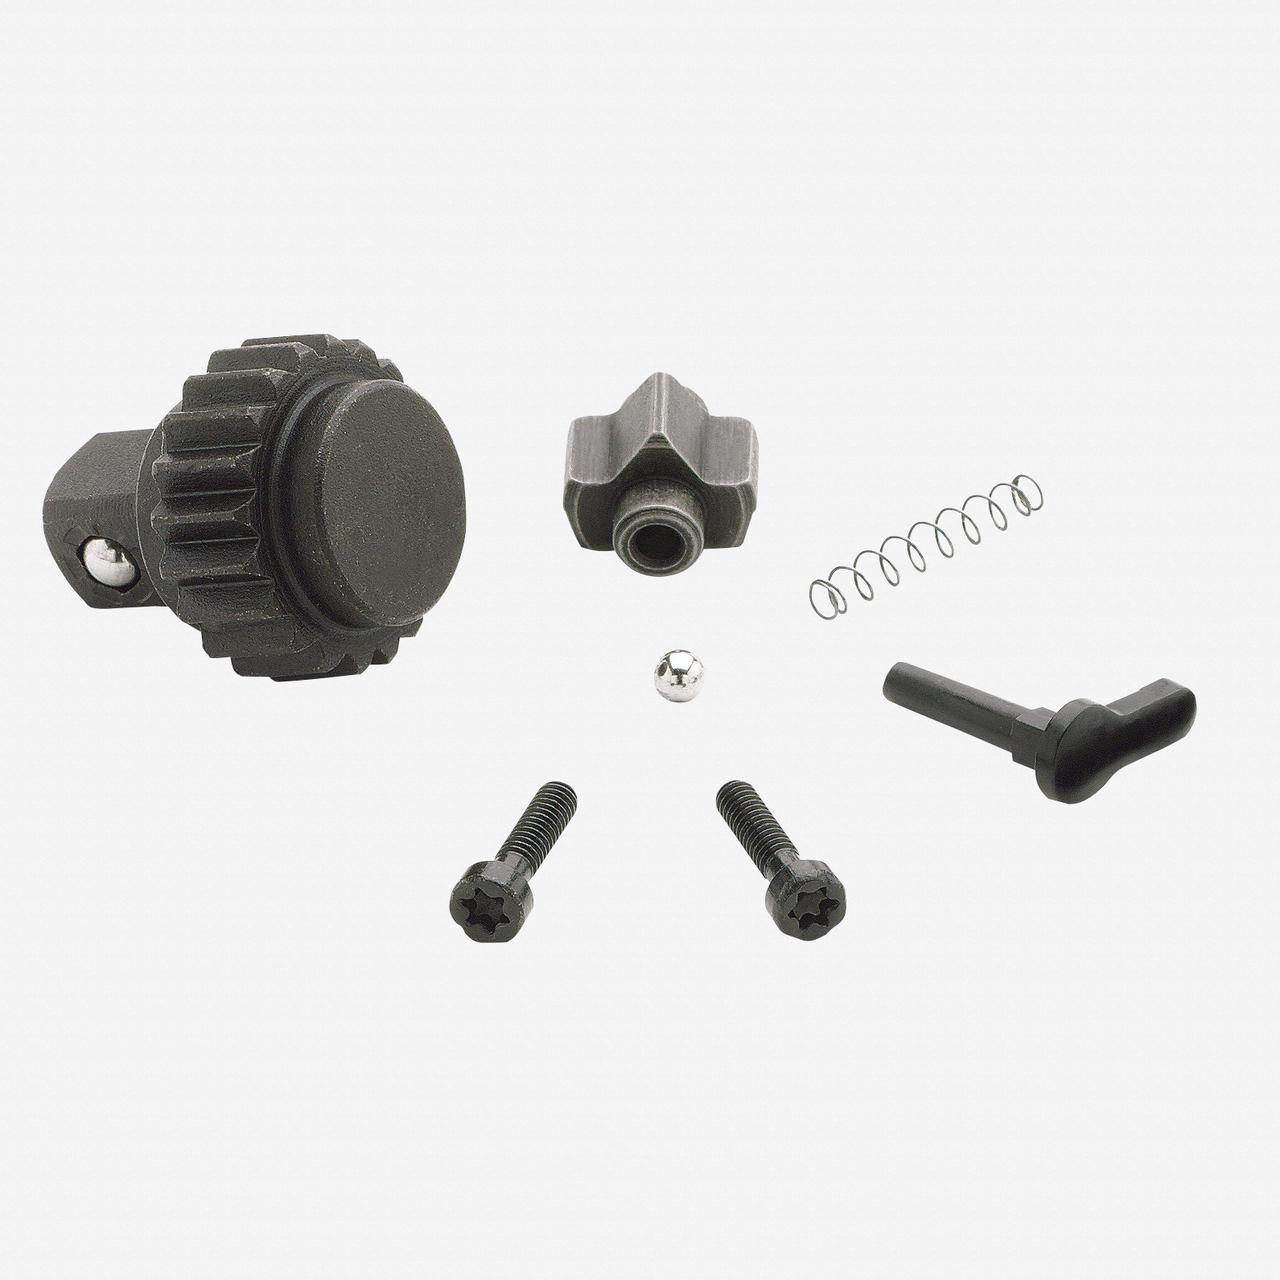 "Hazet 863P/7N 1/4"" Ratchet Rebuild Spare Parts Kit - KC Tool"